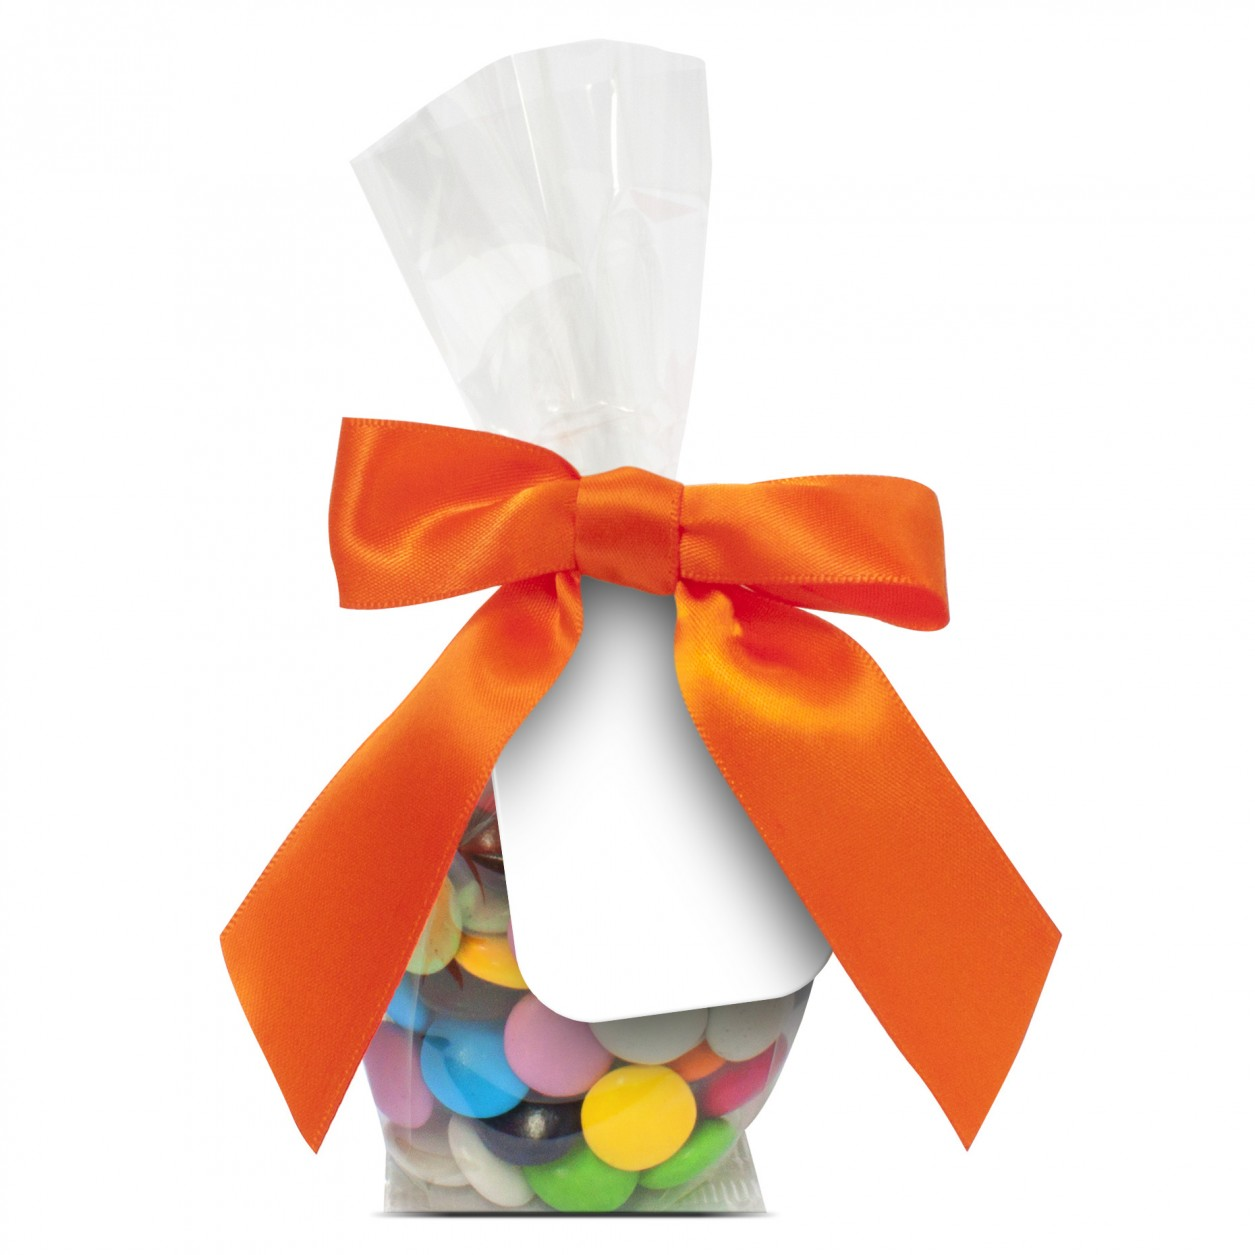 Printed Swing Tag Bag - Various Sweets from £1.69 | Sweets at ...